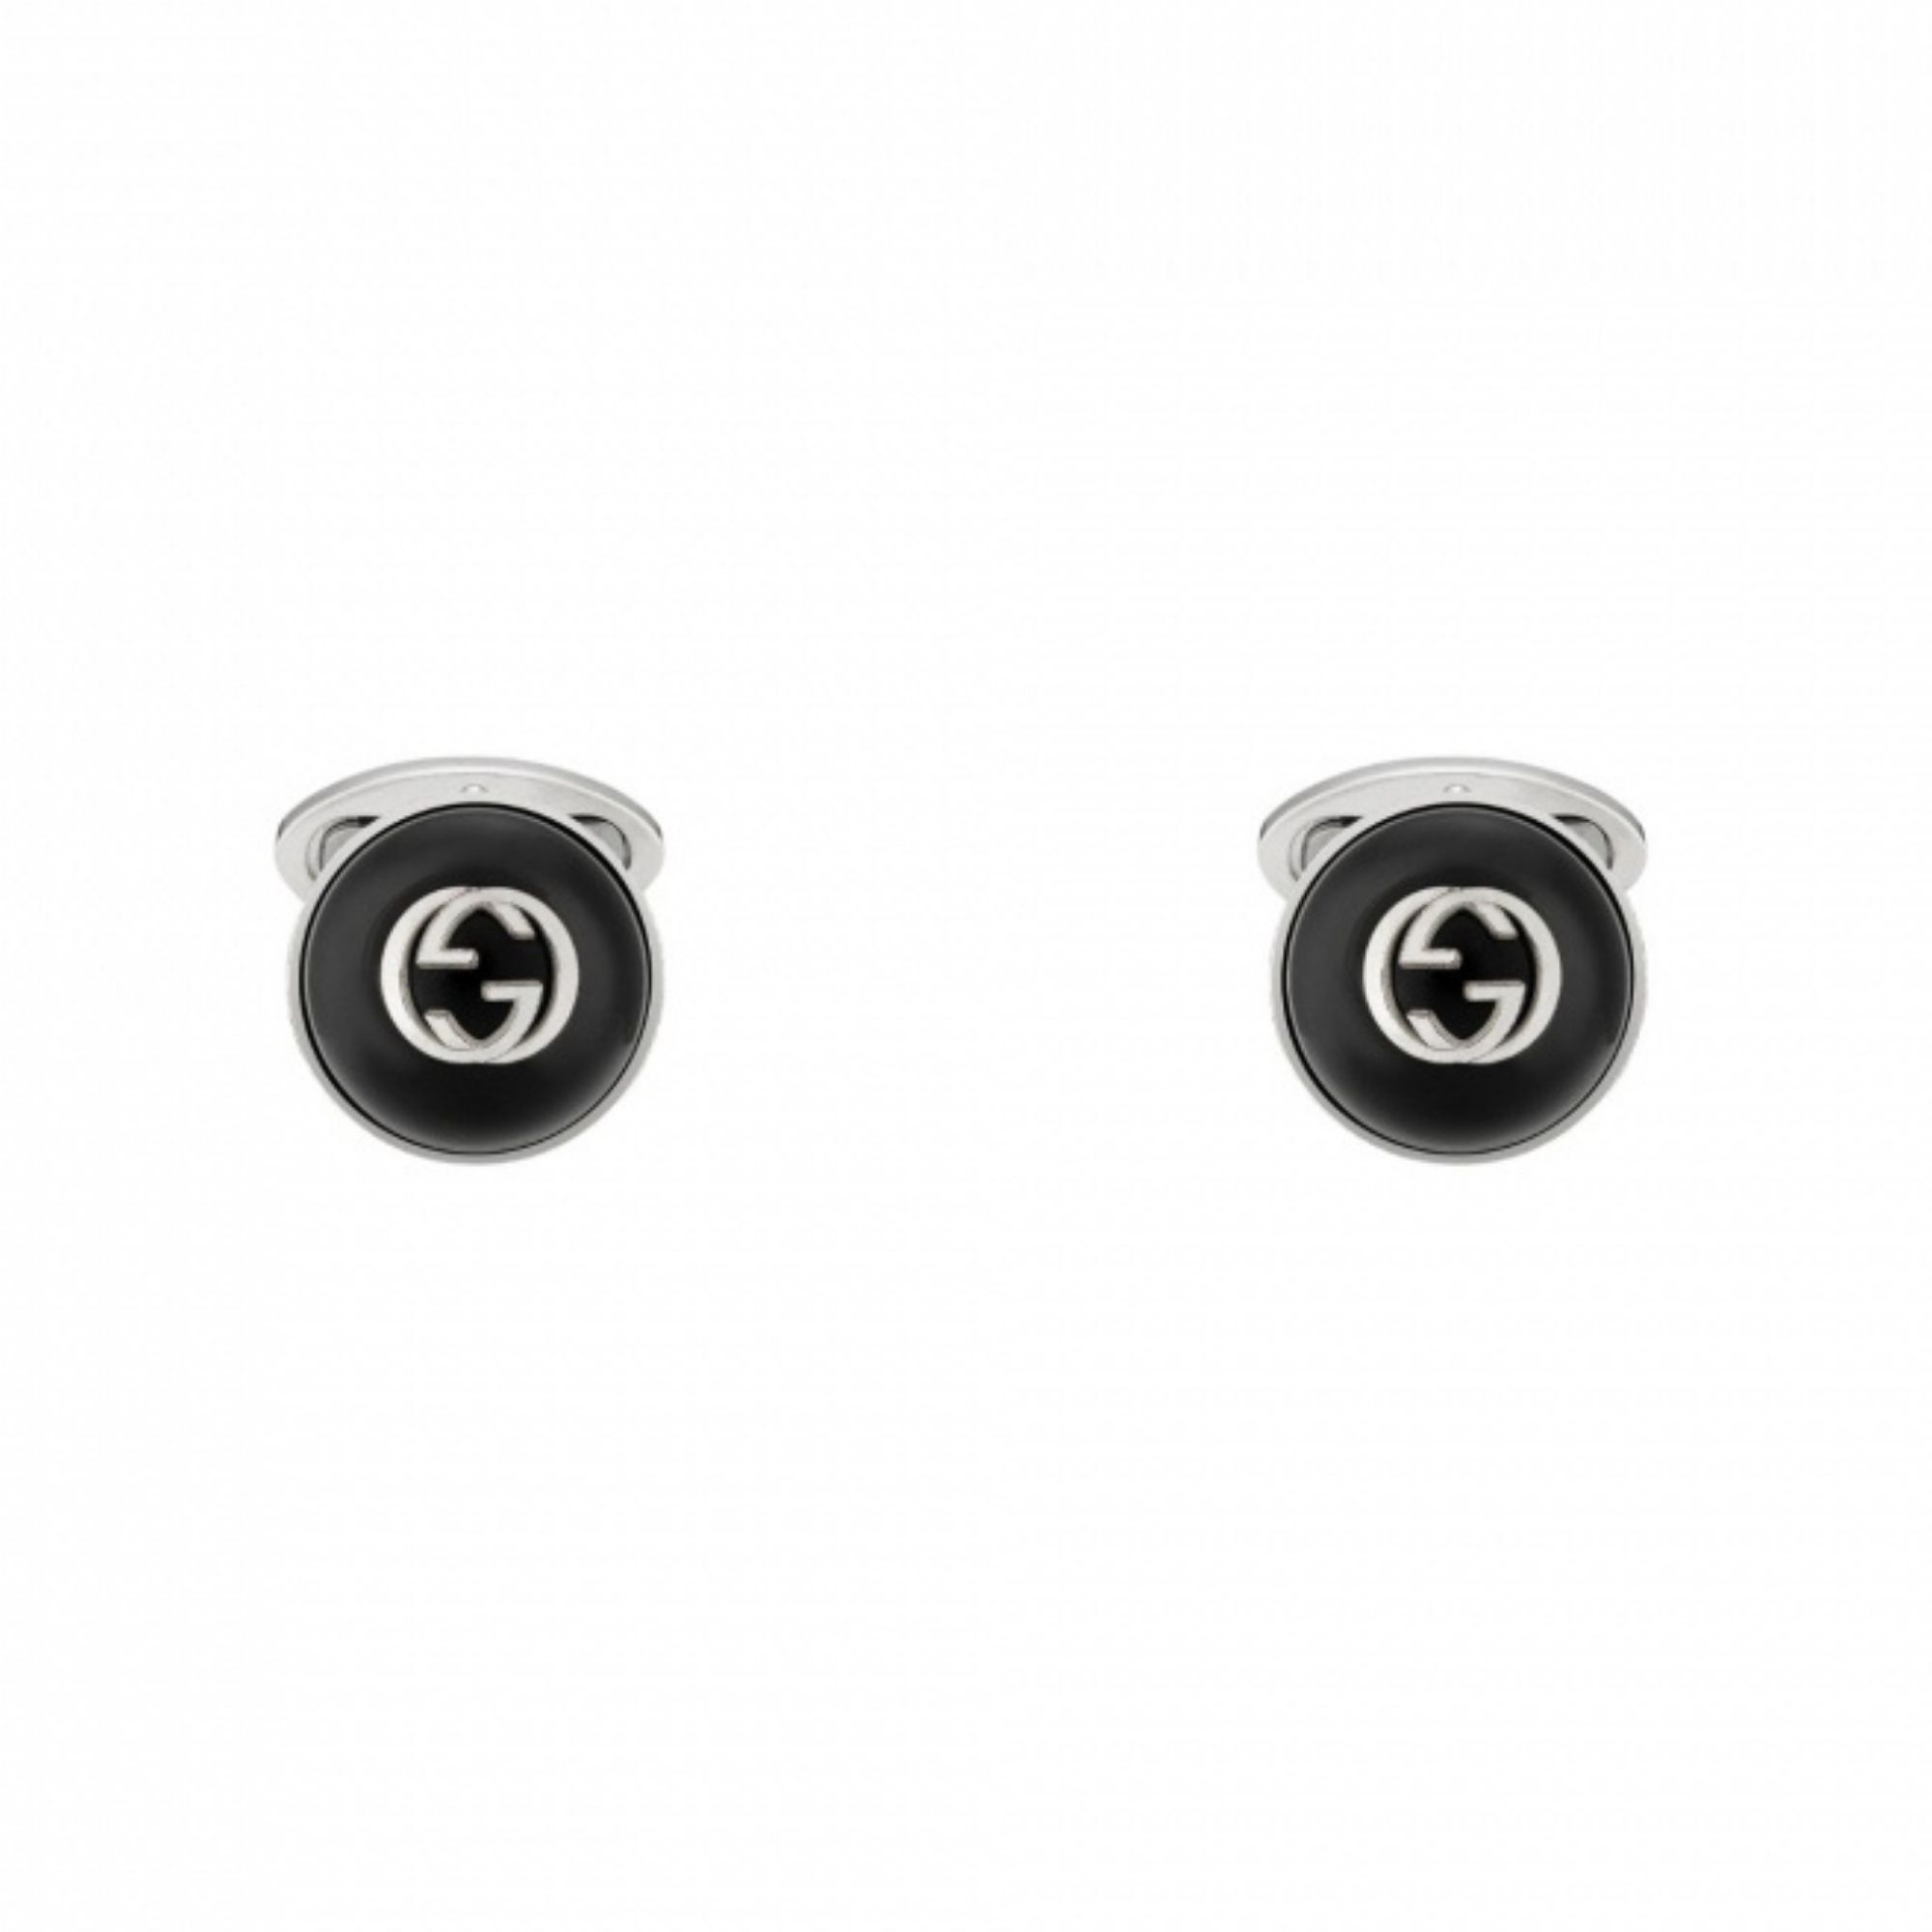 645589-J8480-8163-onix-gucci-cufflinks-gemelli-onice-sconto-discount-silver